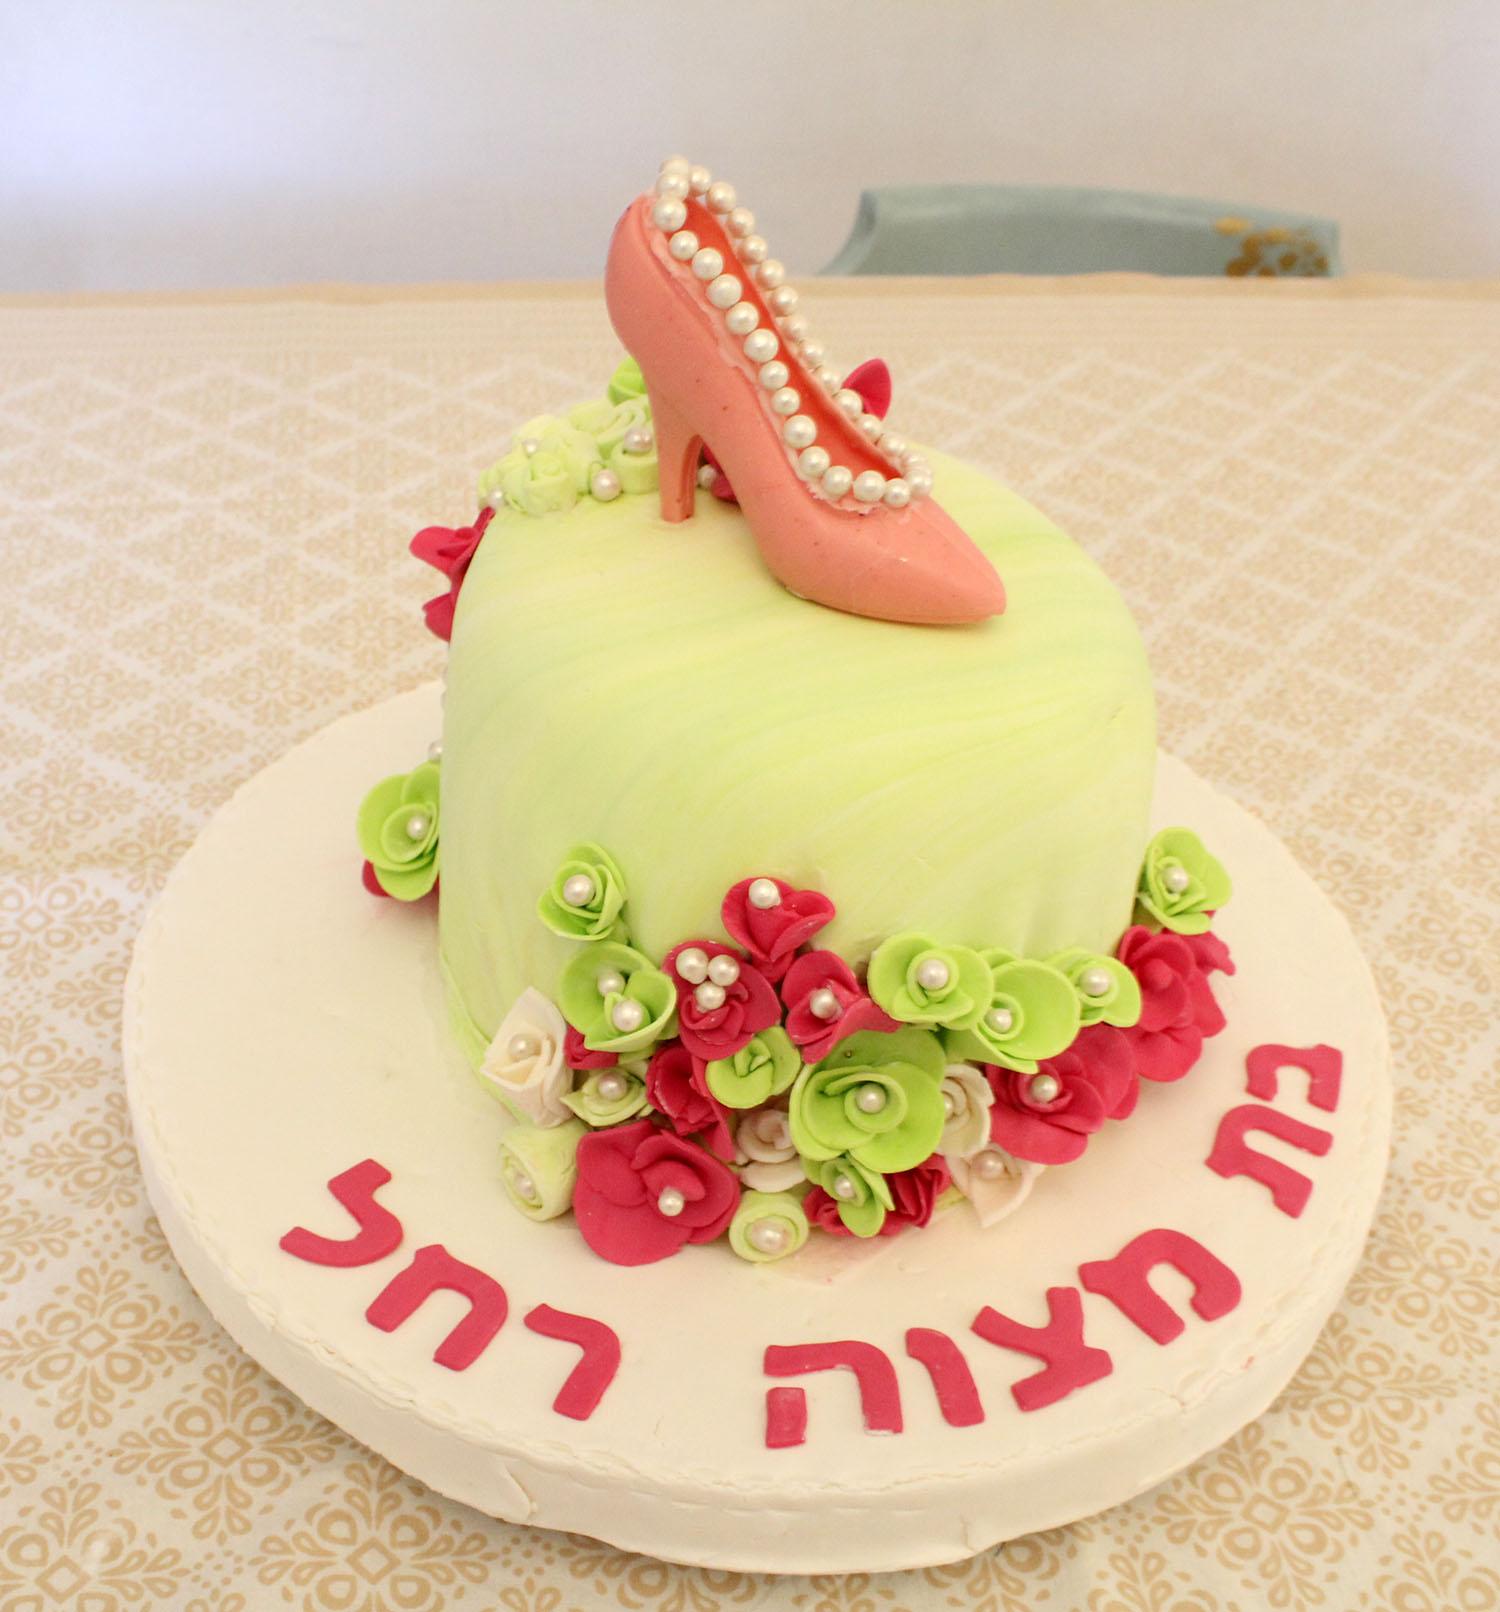 IMG 6342 - עוגה לבת מצוה